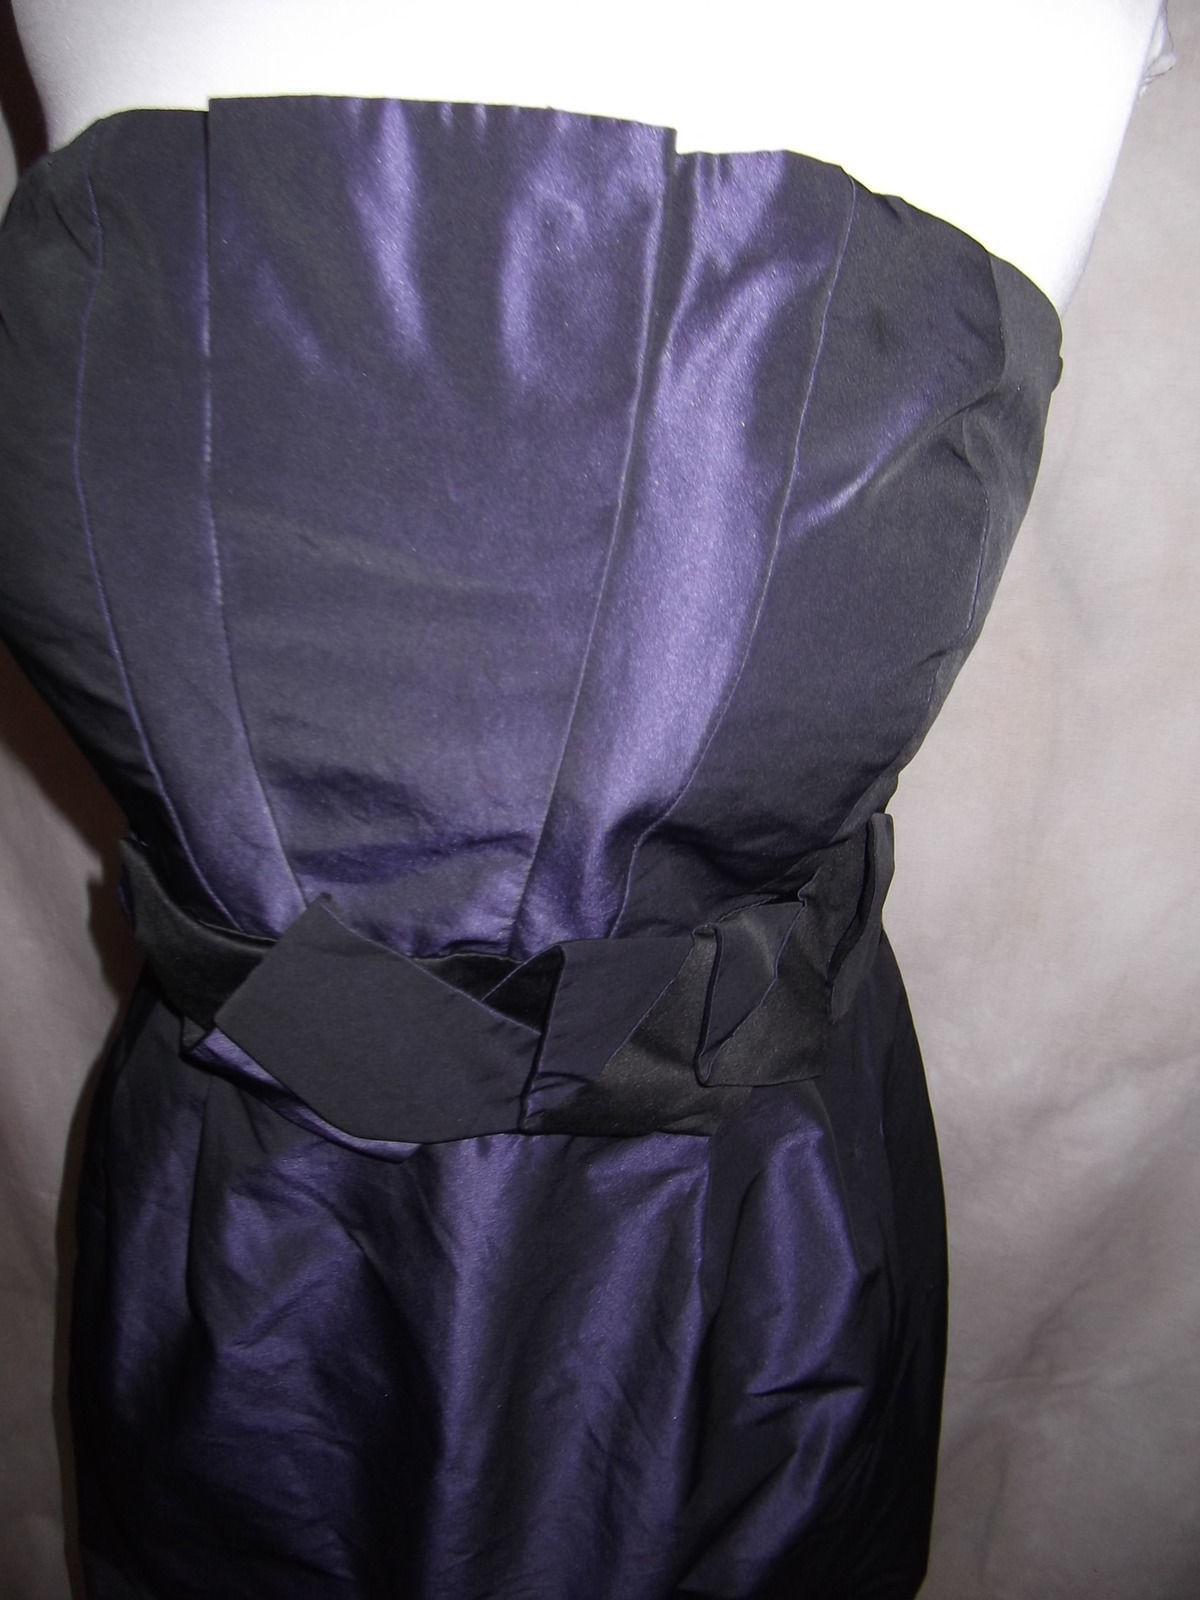 New BCBG Strapless Dress Taffeta Bubble Size 12 Eggplant Purple Pleated Bust